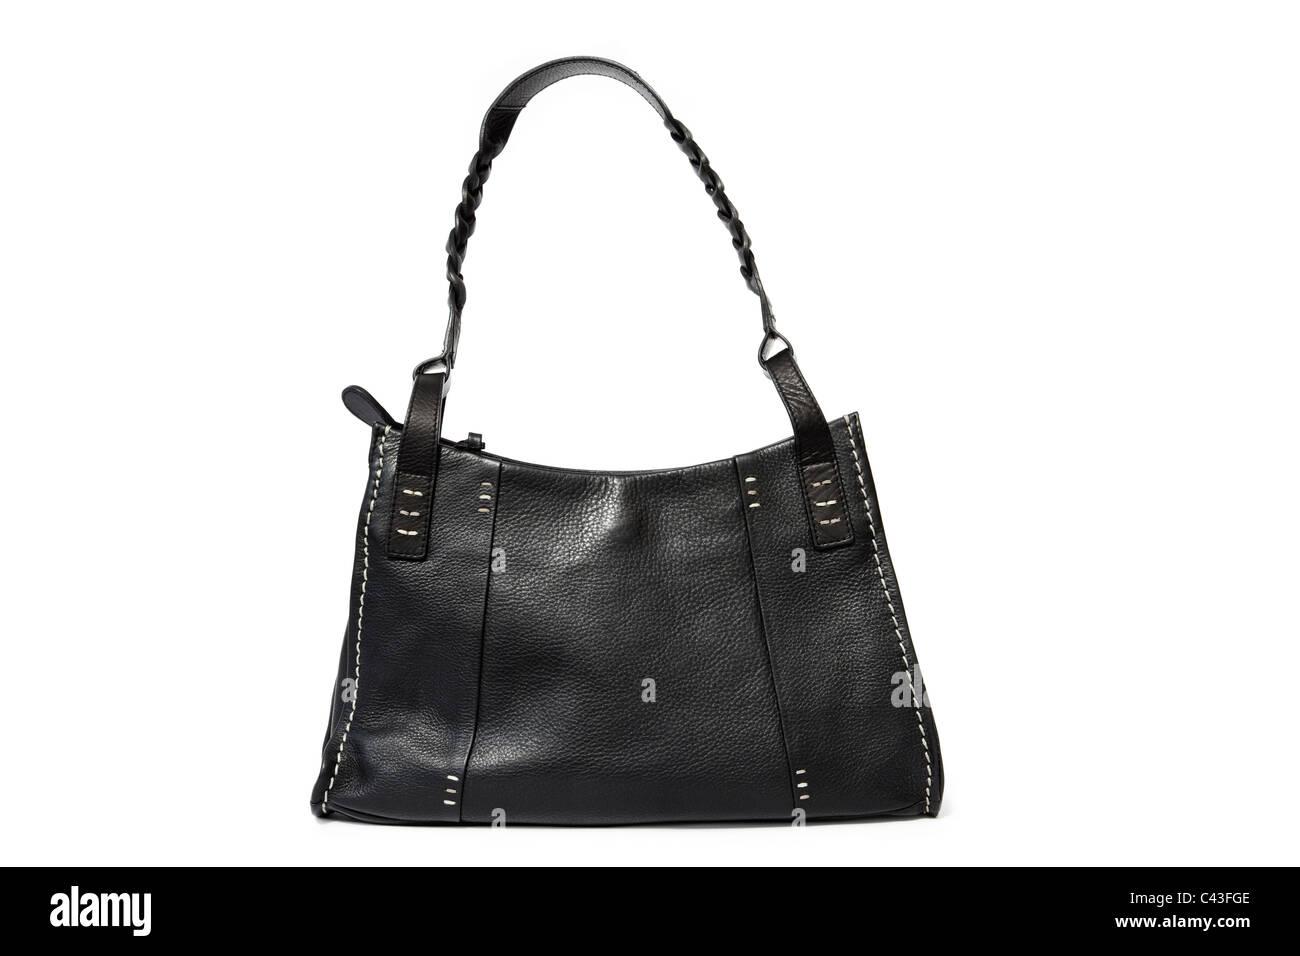 Women's black leather Radley handbag purse bag with shoulder strap on a white background - Stock Image